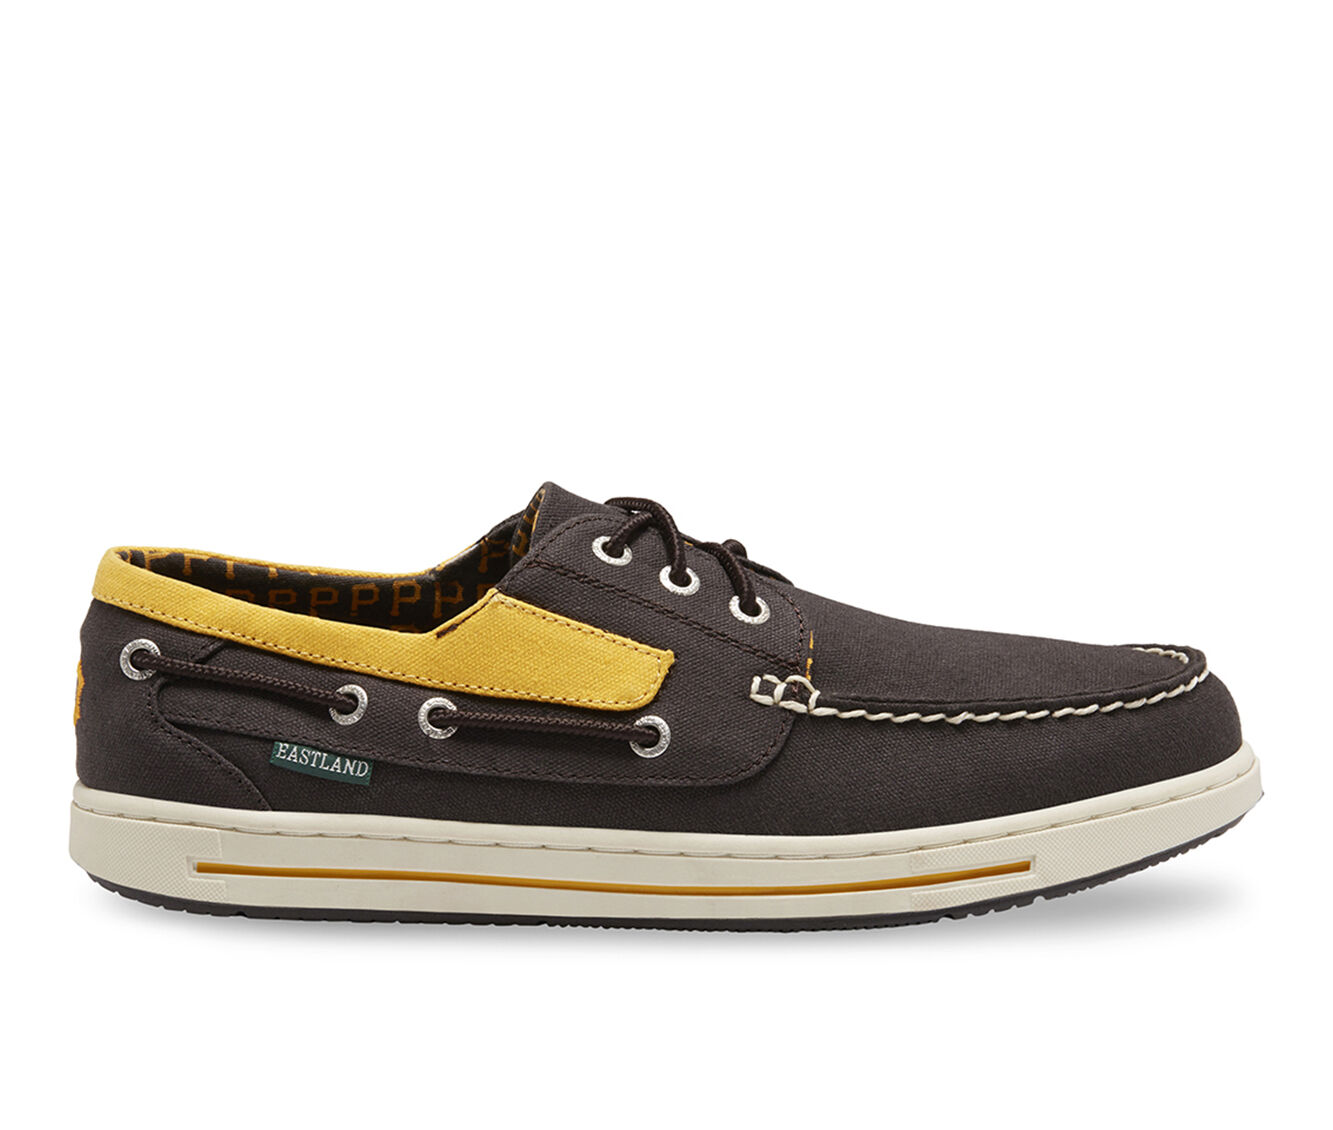 uk shoes_kd1467